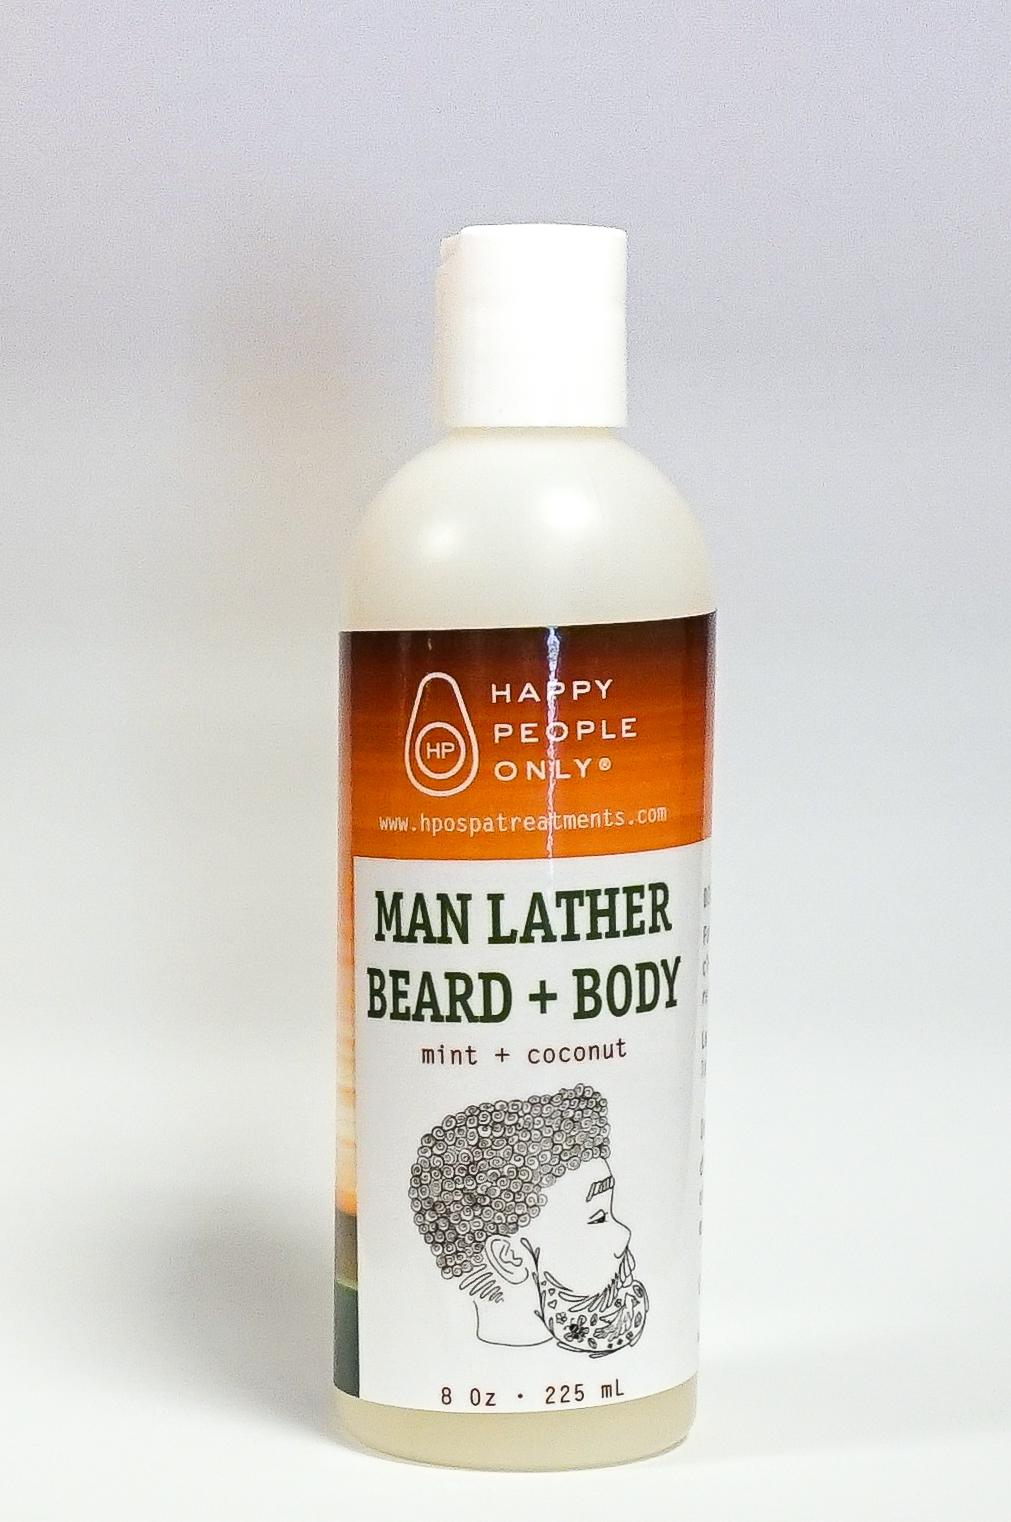 Man Lather Beard + Body